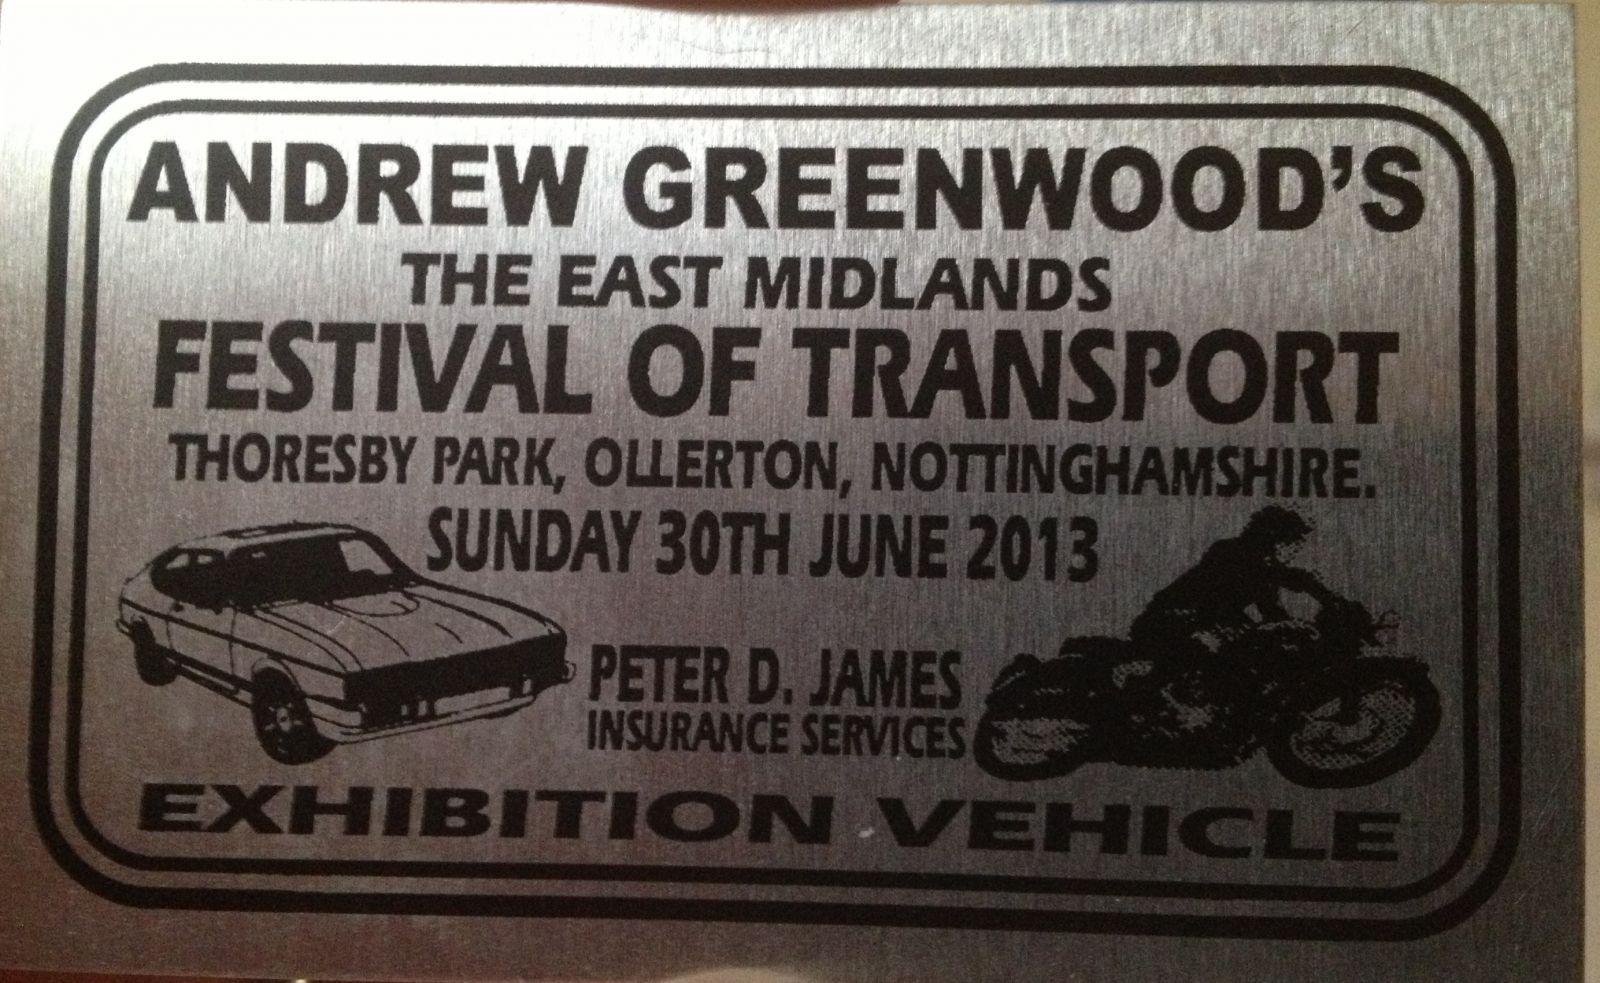 Exhibition vehicle badge car gets